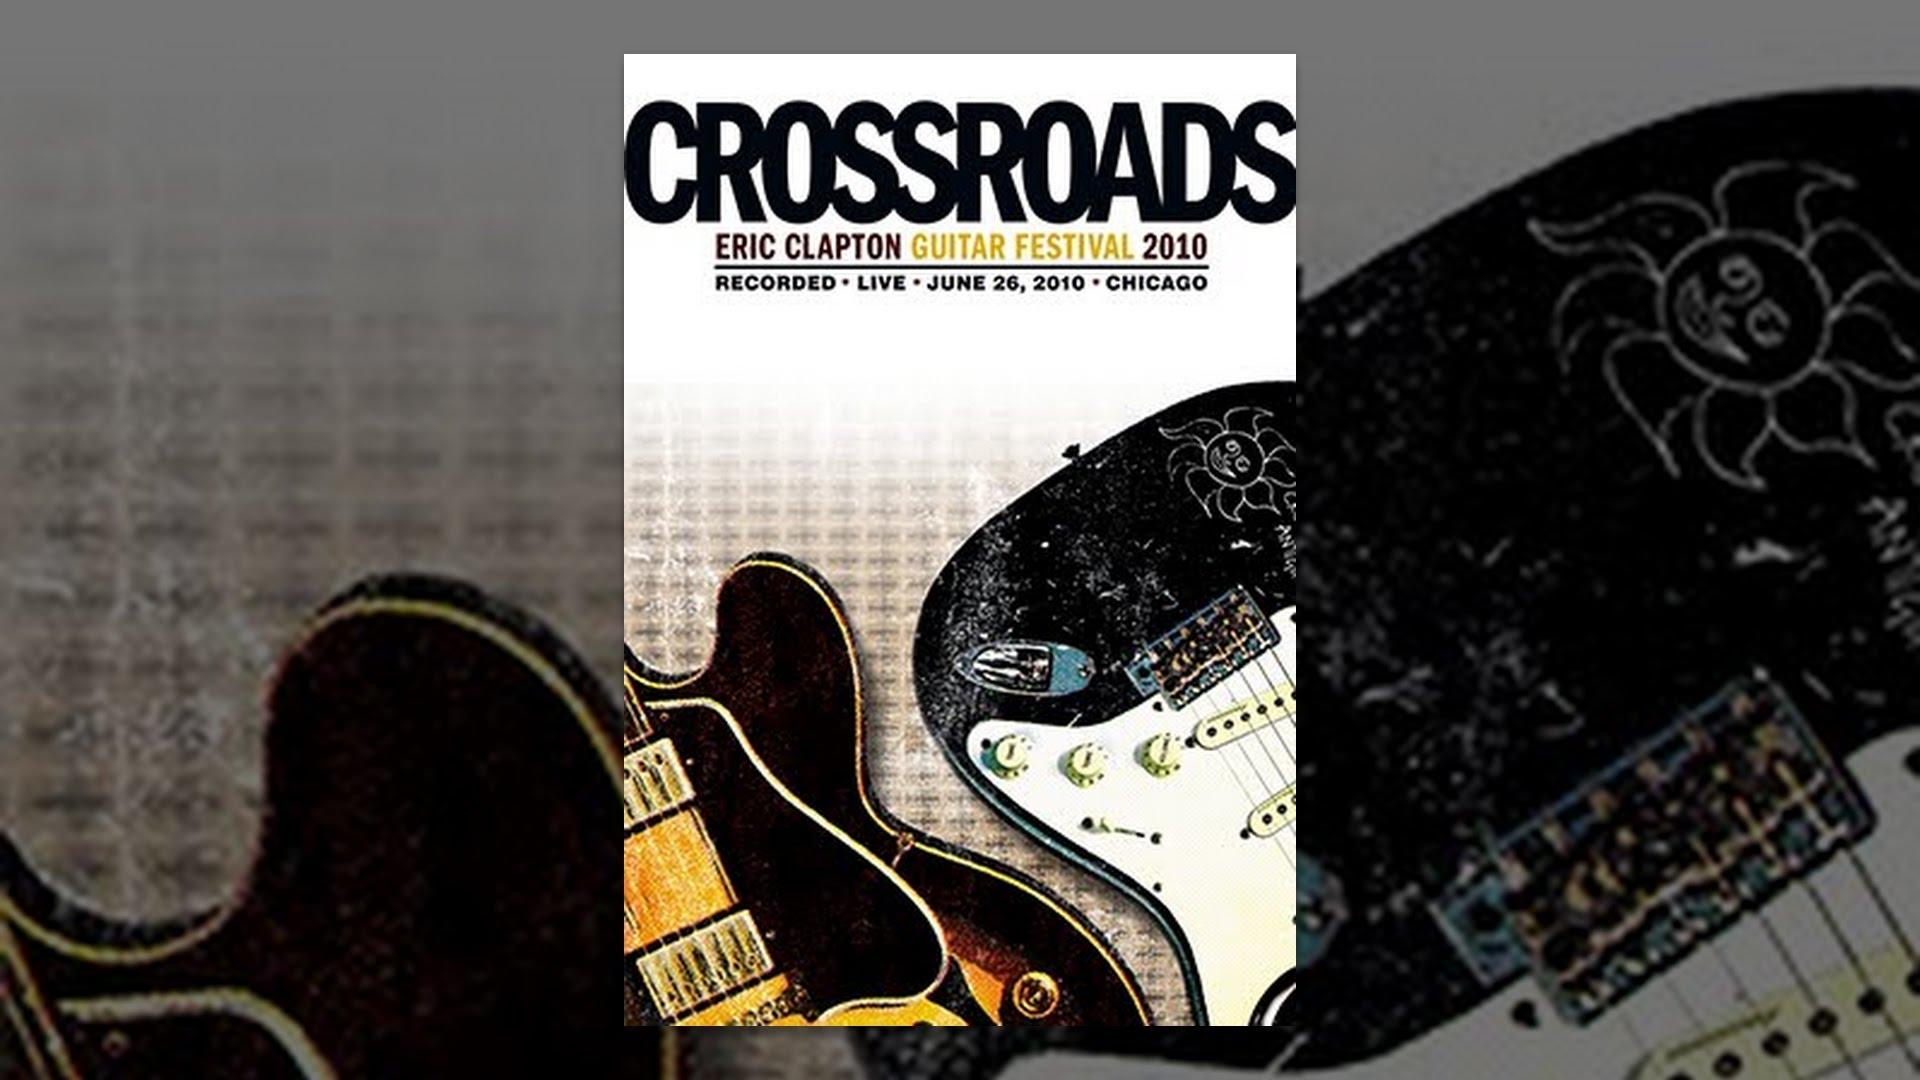 eric clapton crossroads guitar festival 2010 youtube. Black Bedroom Furniture Sets. Home Design Ideas